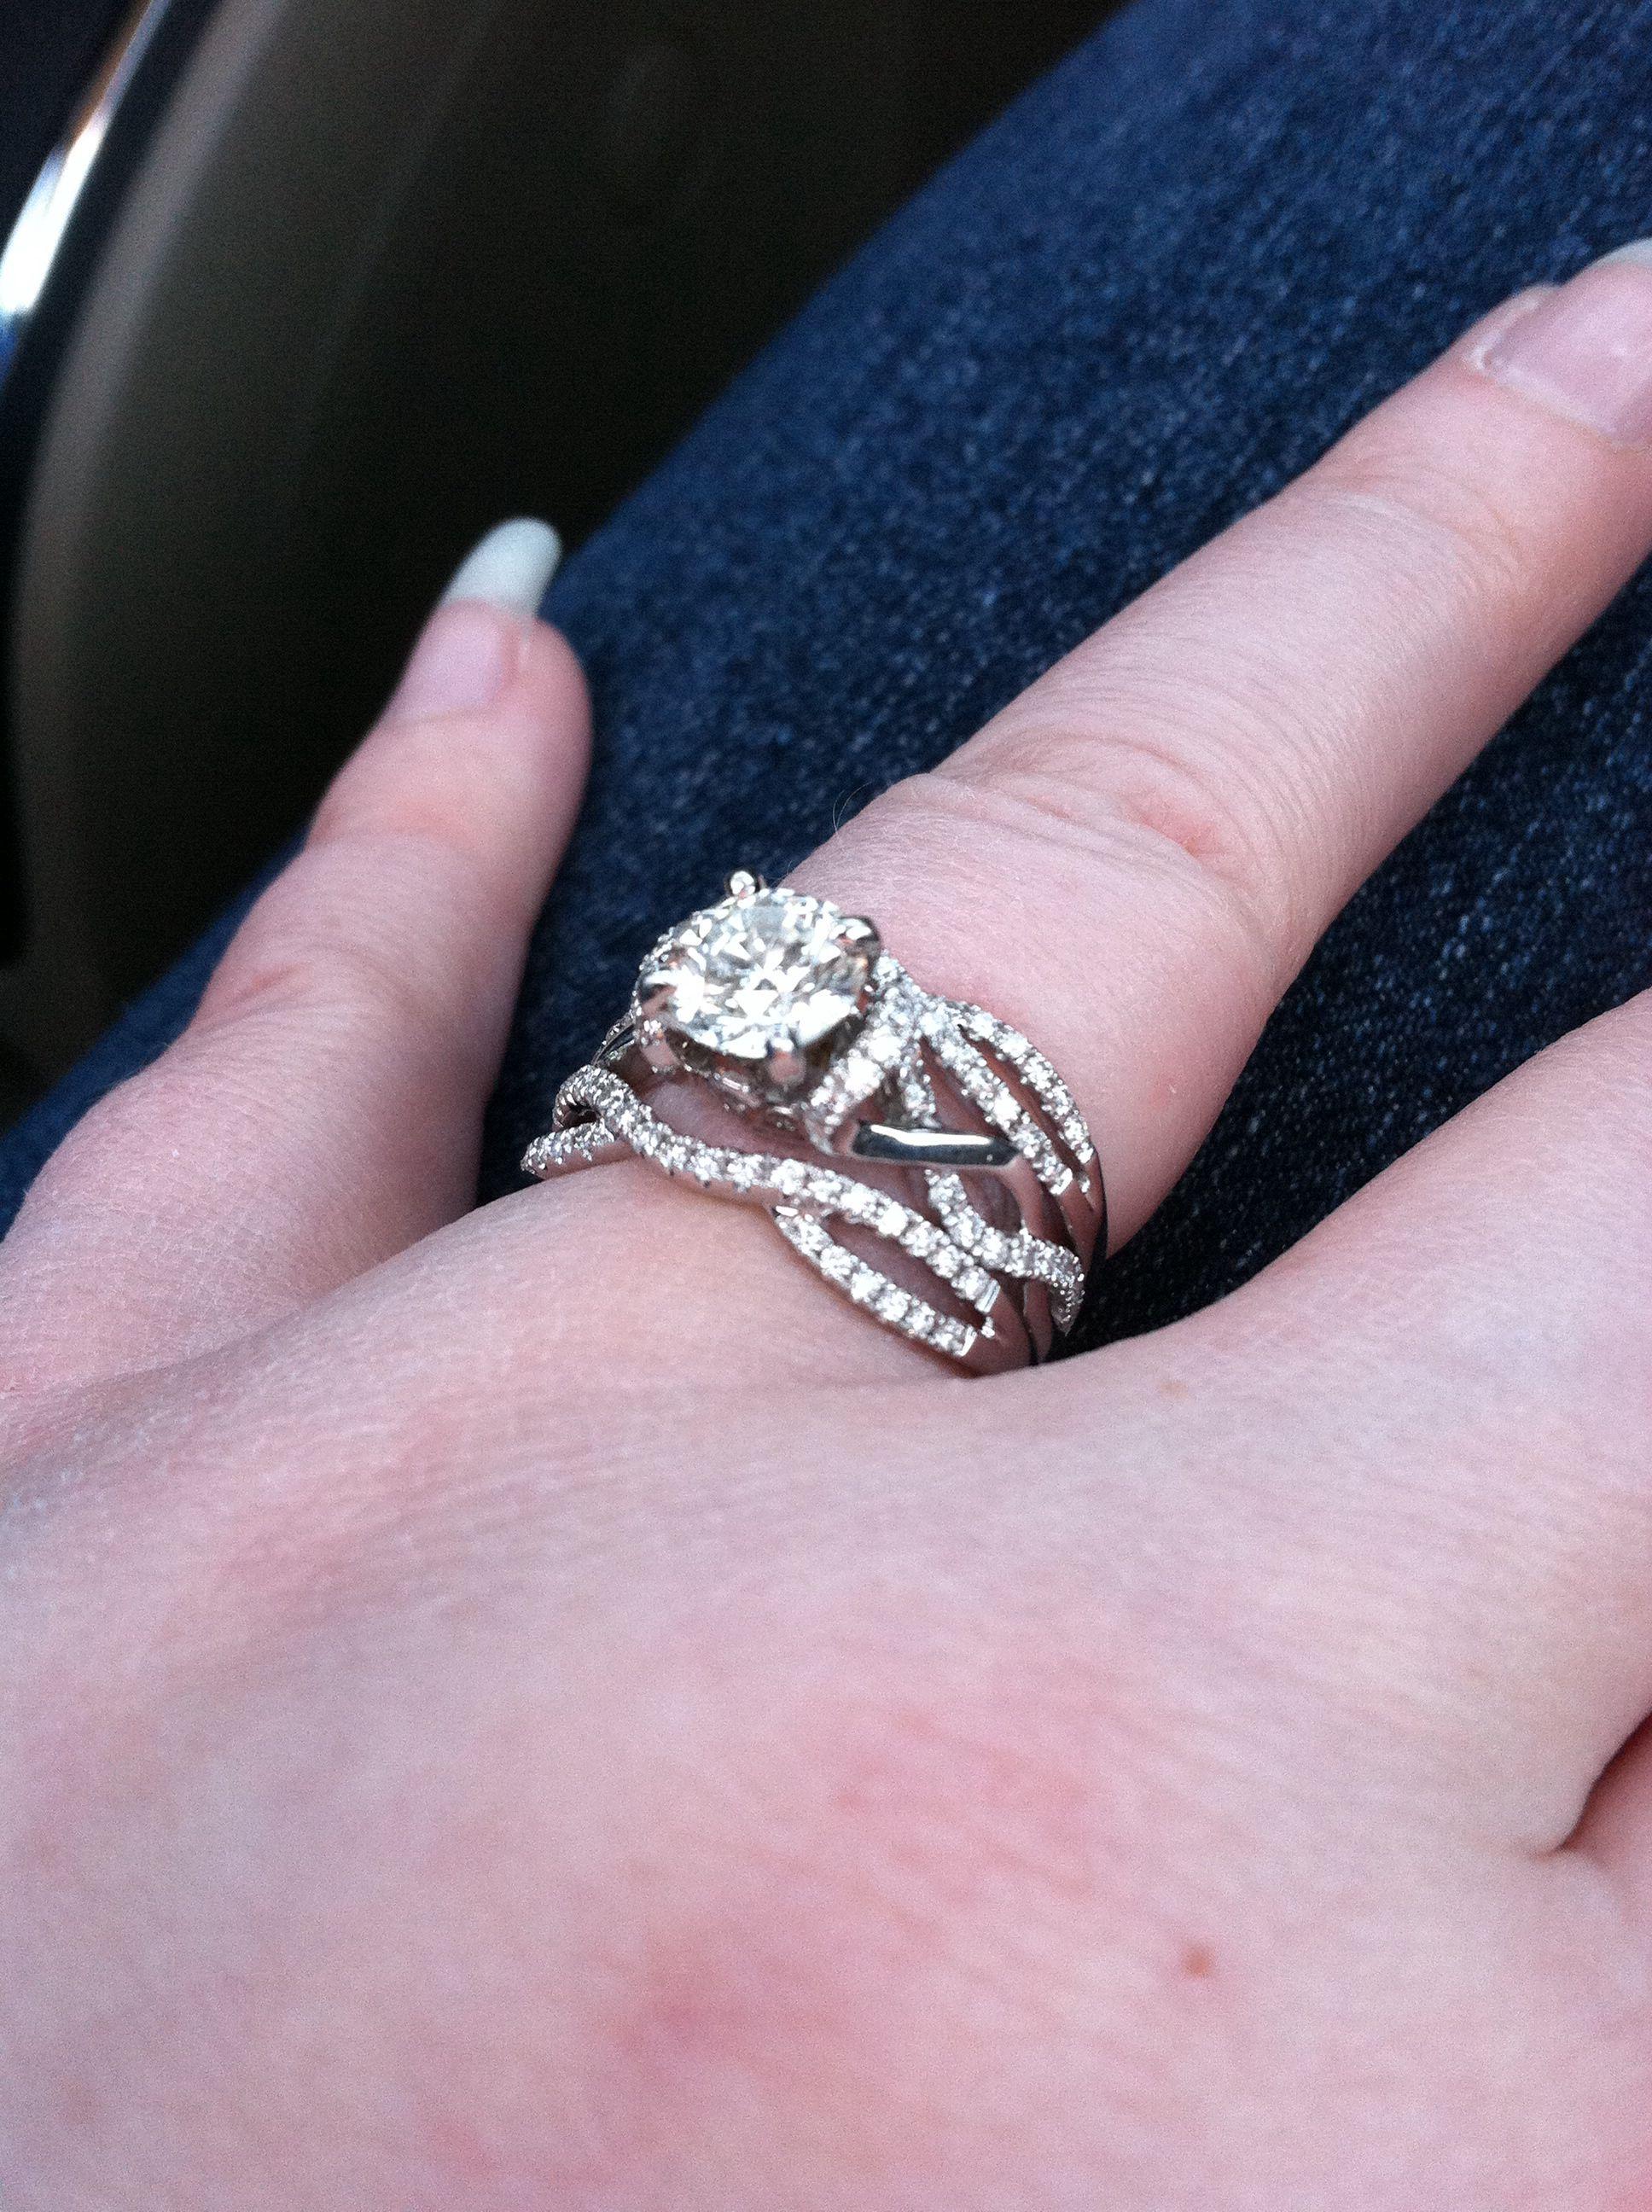 Engagement Ring Inserted Into Wedding Band Engagement Ring Insert Engagement Wedding Bands